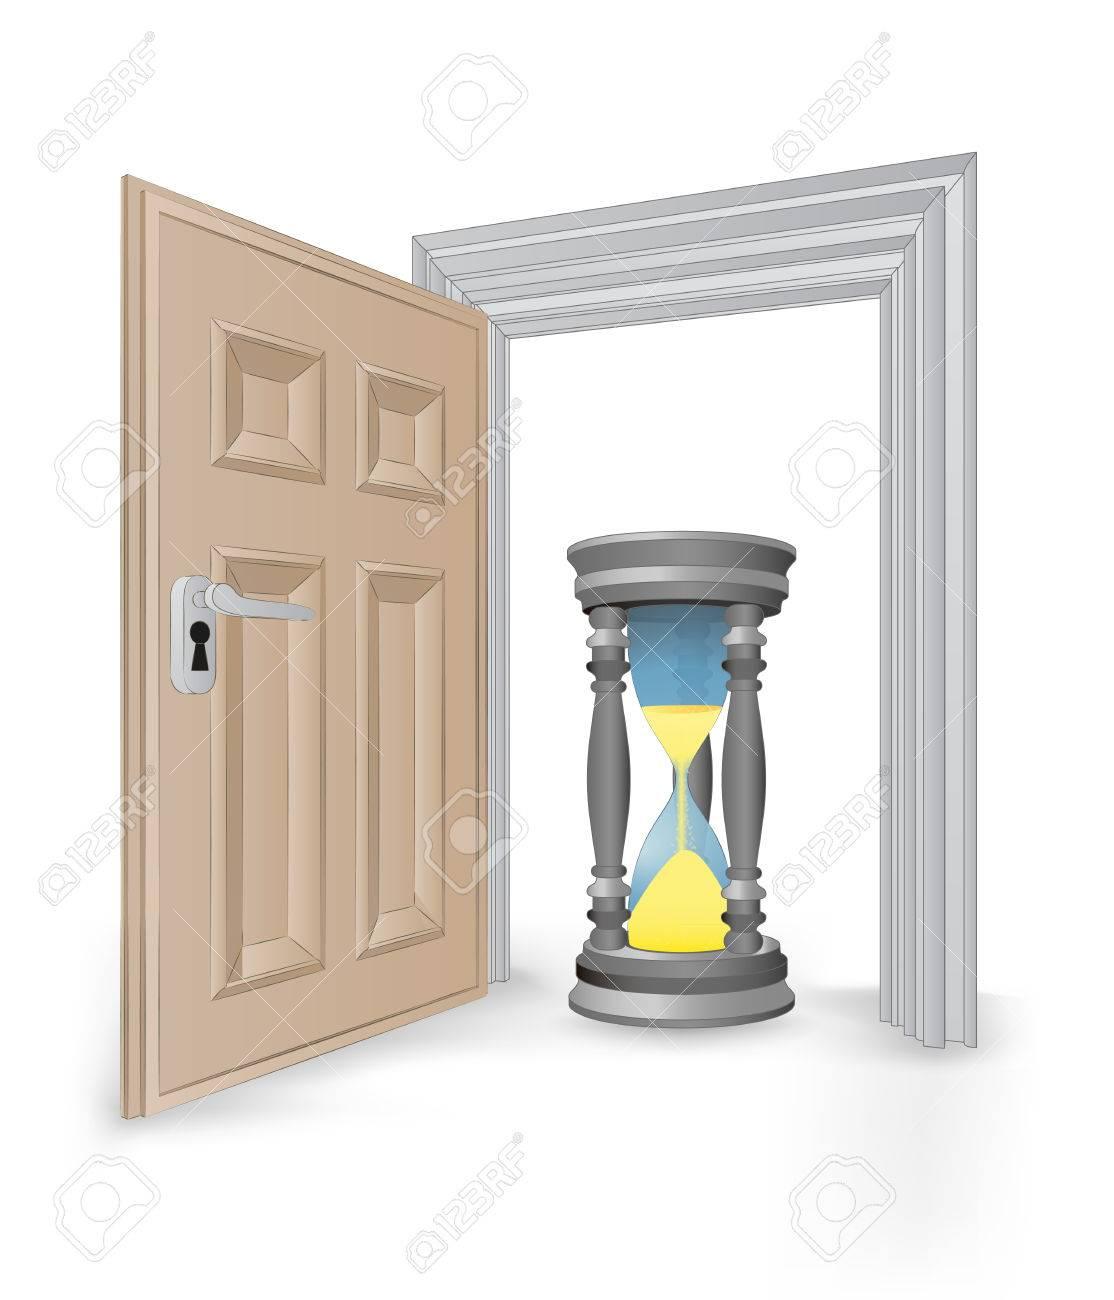 open isolated doorway frame with running hourglass vector illustration Stock Vector - 24668115